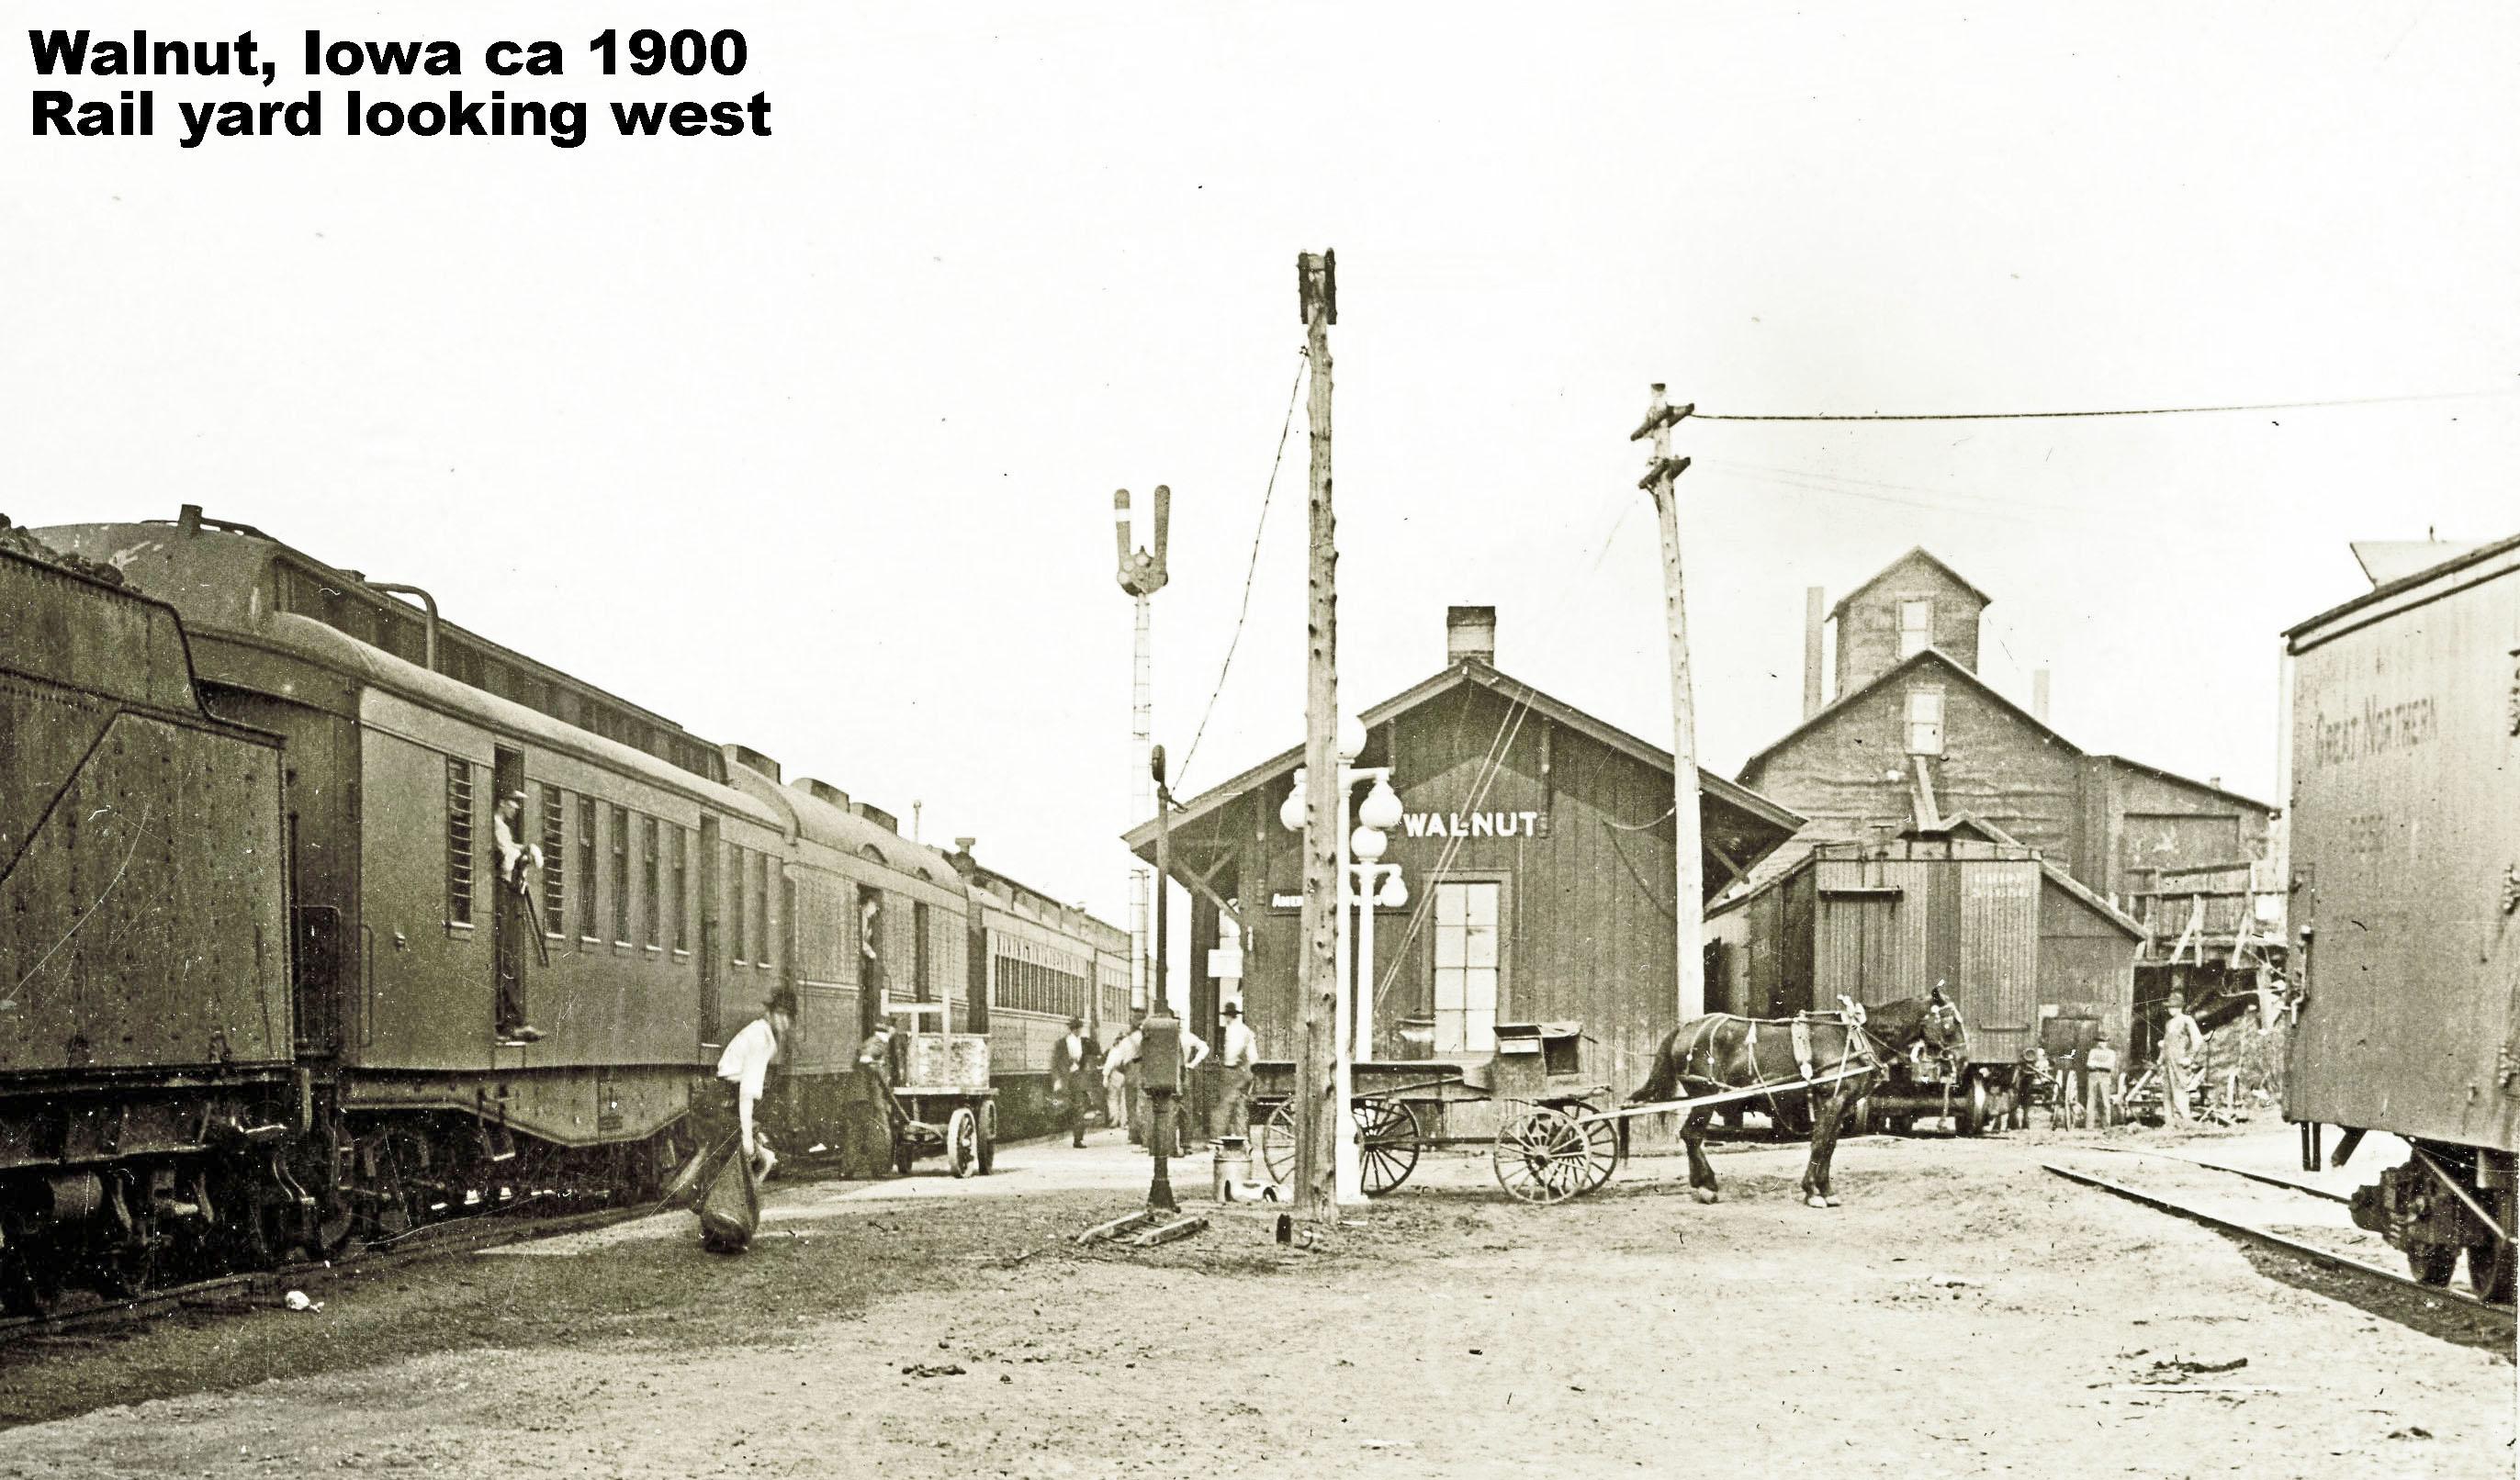 1900 train arrives